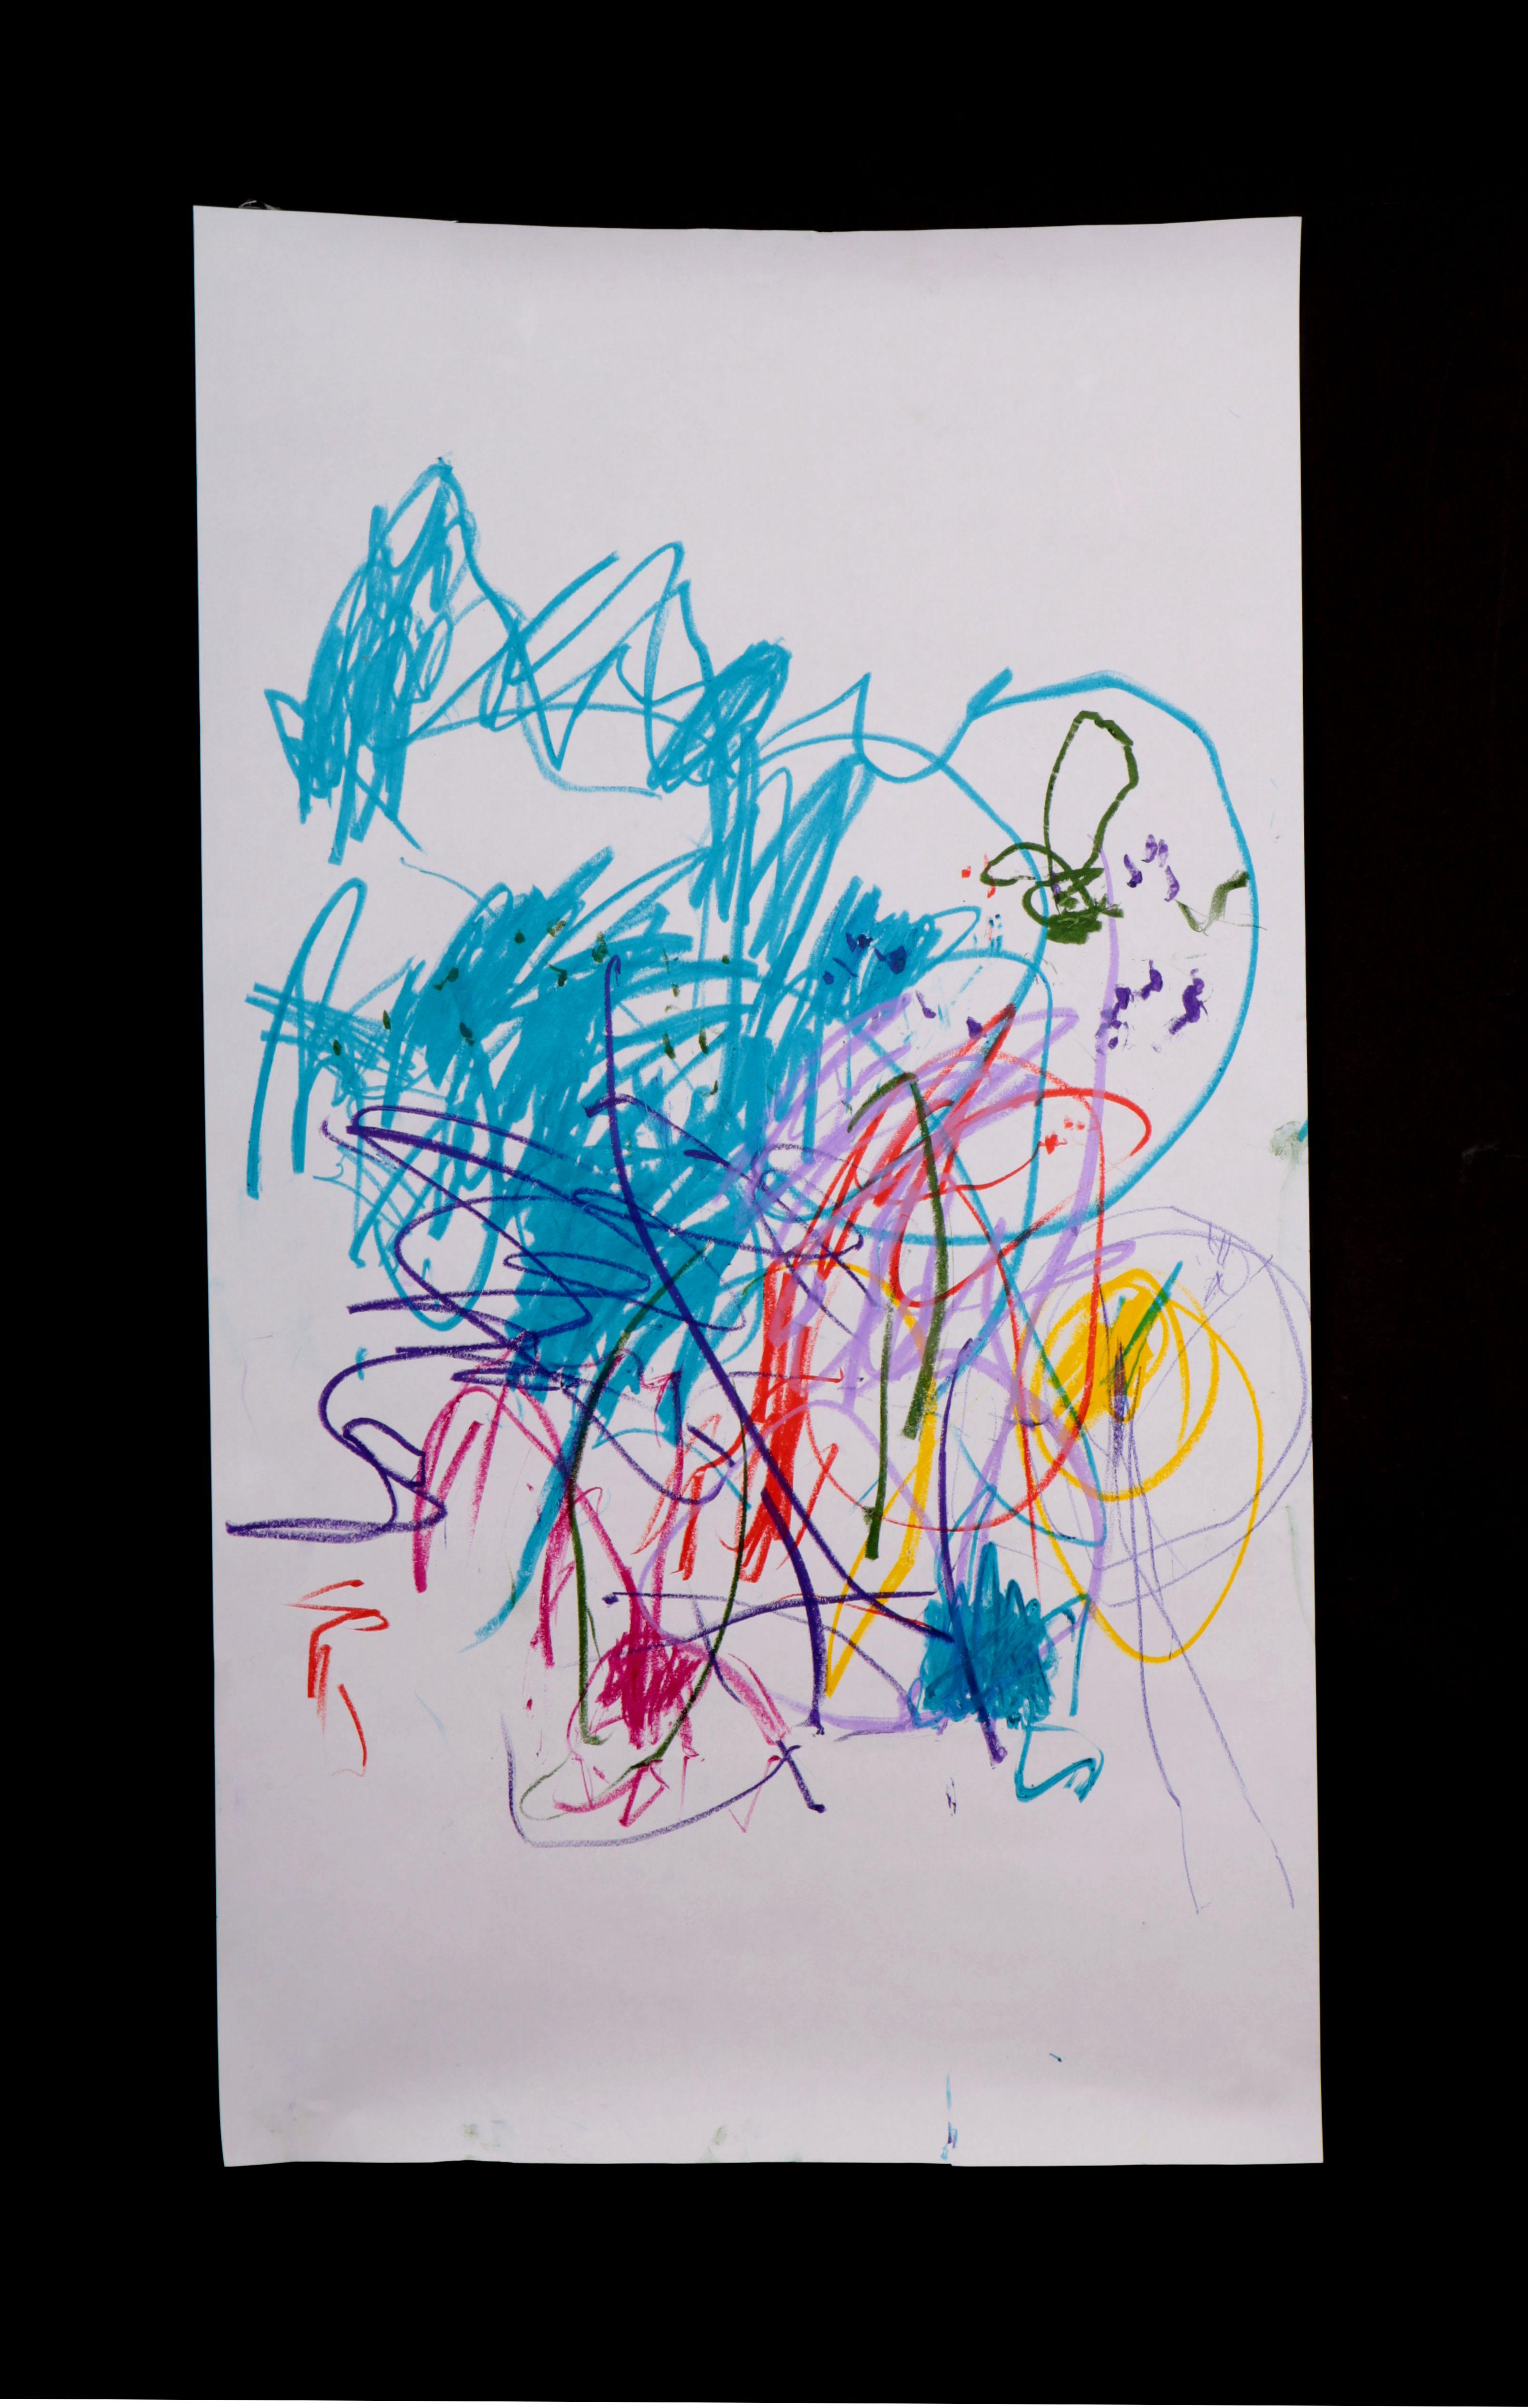 Art by Anastasia. Untitled #71. Gel sticks on paper.